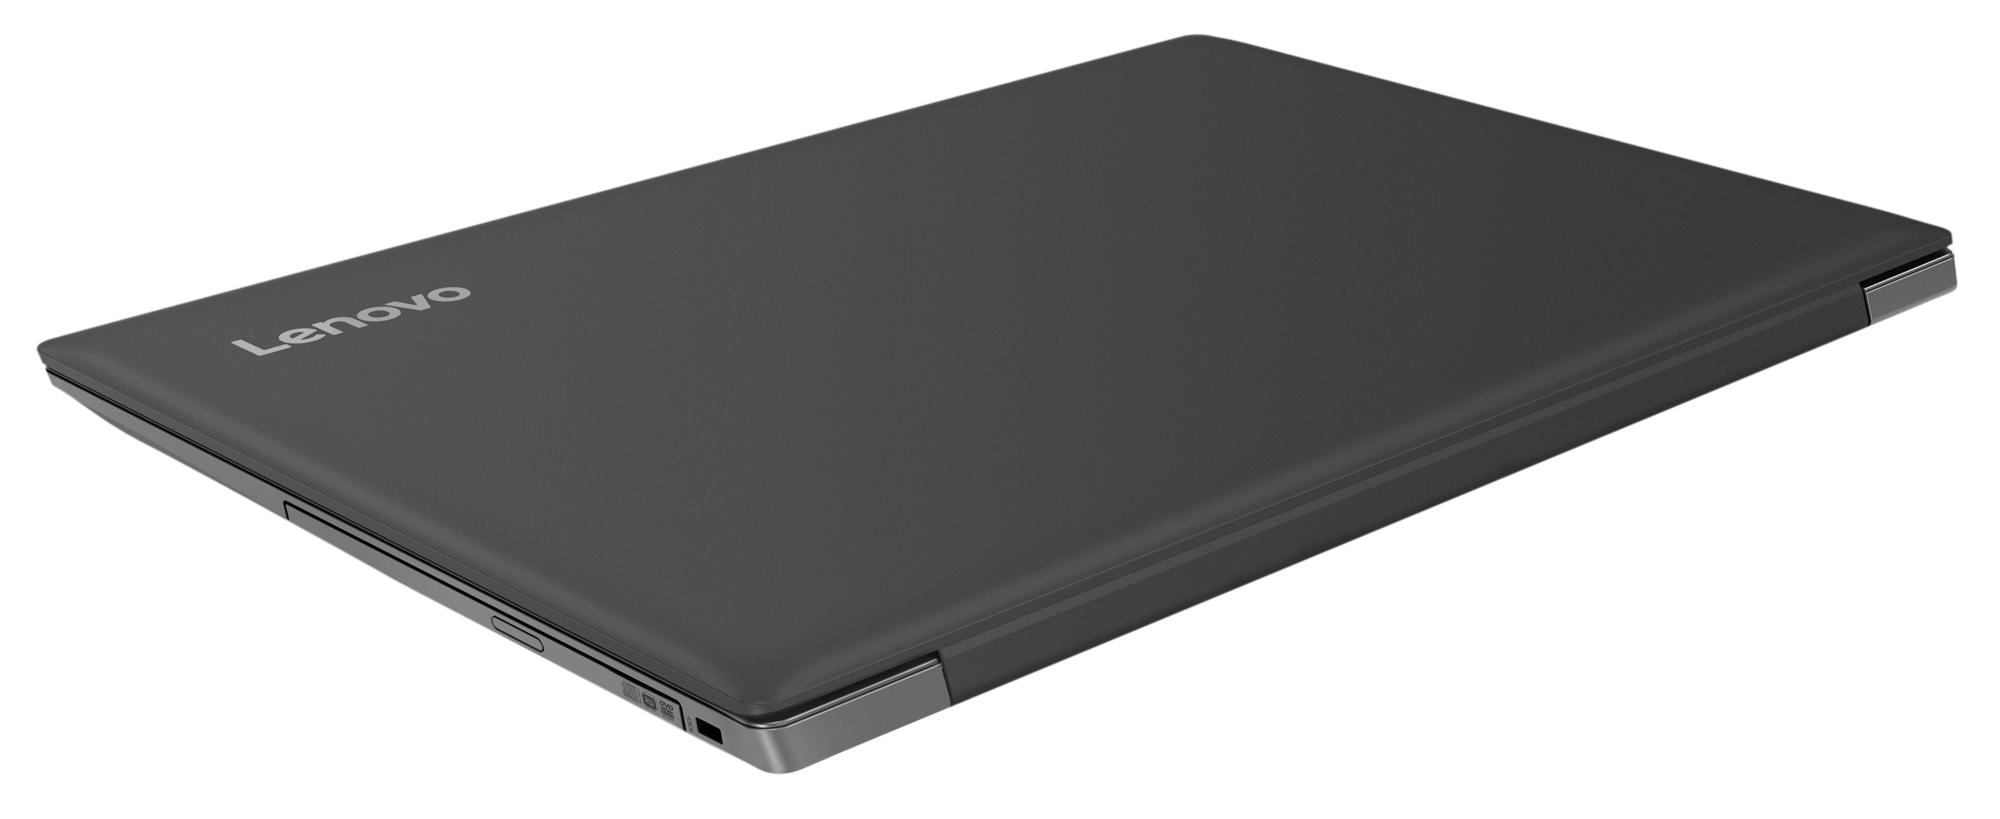 Фото  Ноутбук Lenovo ideapad 330-15 Onyx Black (81DE01FVRA)